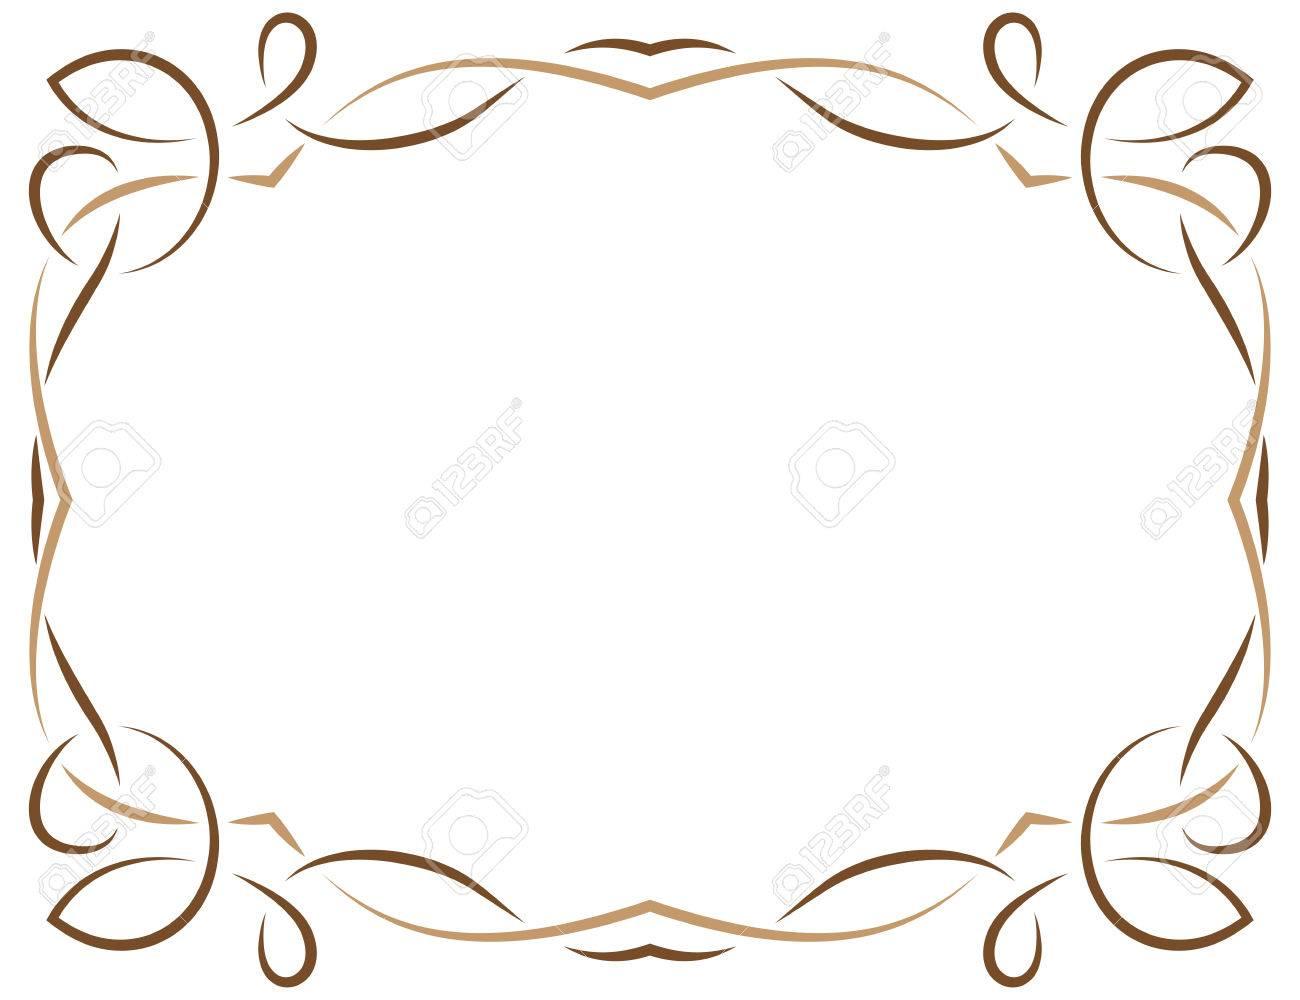 Múltiples Capas De Vector Elegante Marco De Color Marrón Sobre Un ...